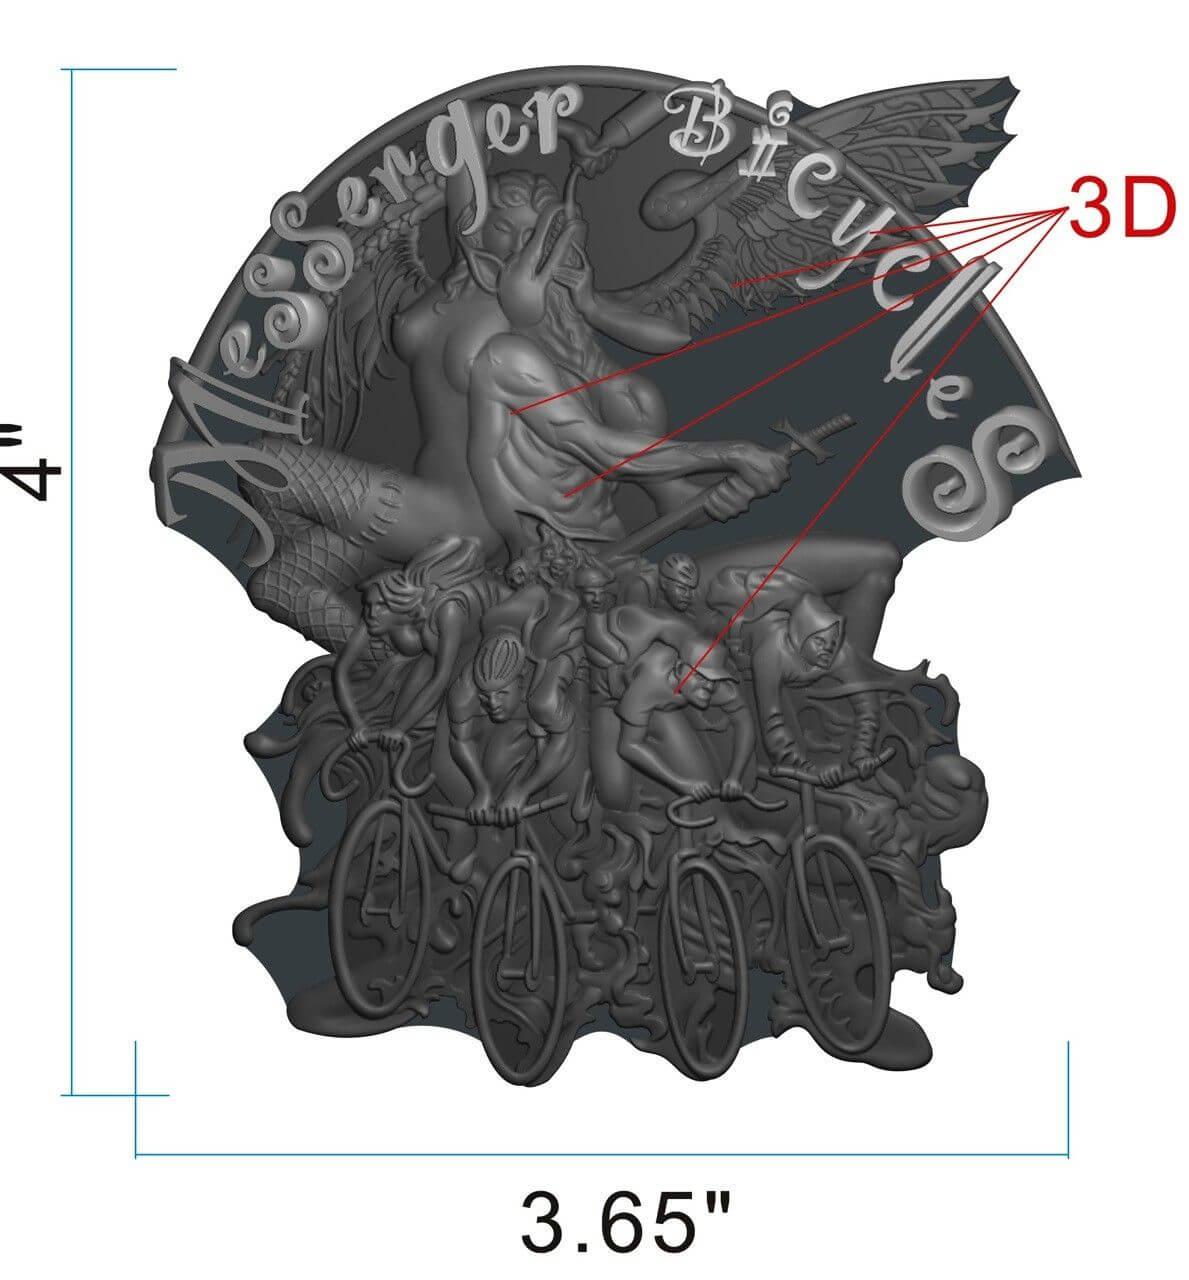 3D Head Tube Badge Emblem